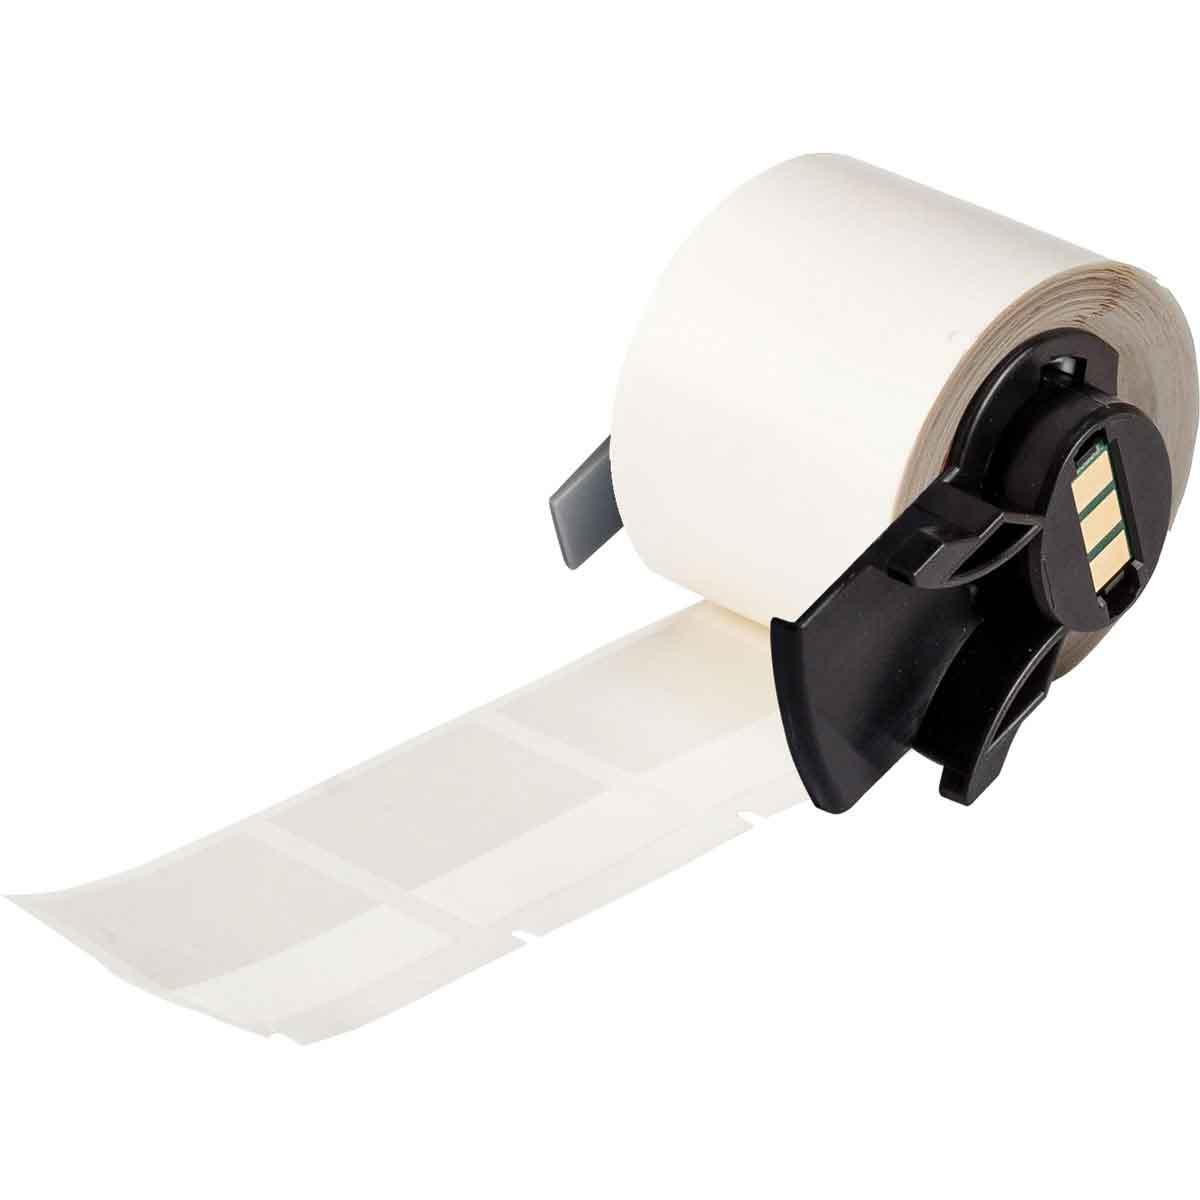 B-427 Self-Laminating Vinyl Brady PTL-32-427-RD TLS 2200 and TLS PC Link 1.5 Width x 1.5 Height Matte Finish Red//Translucent Label 250 per Roll